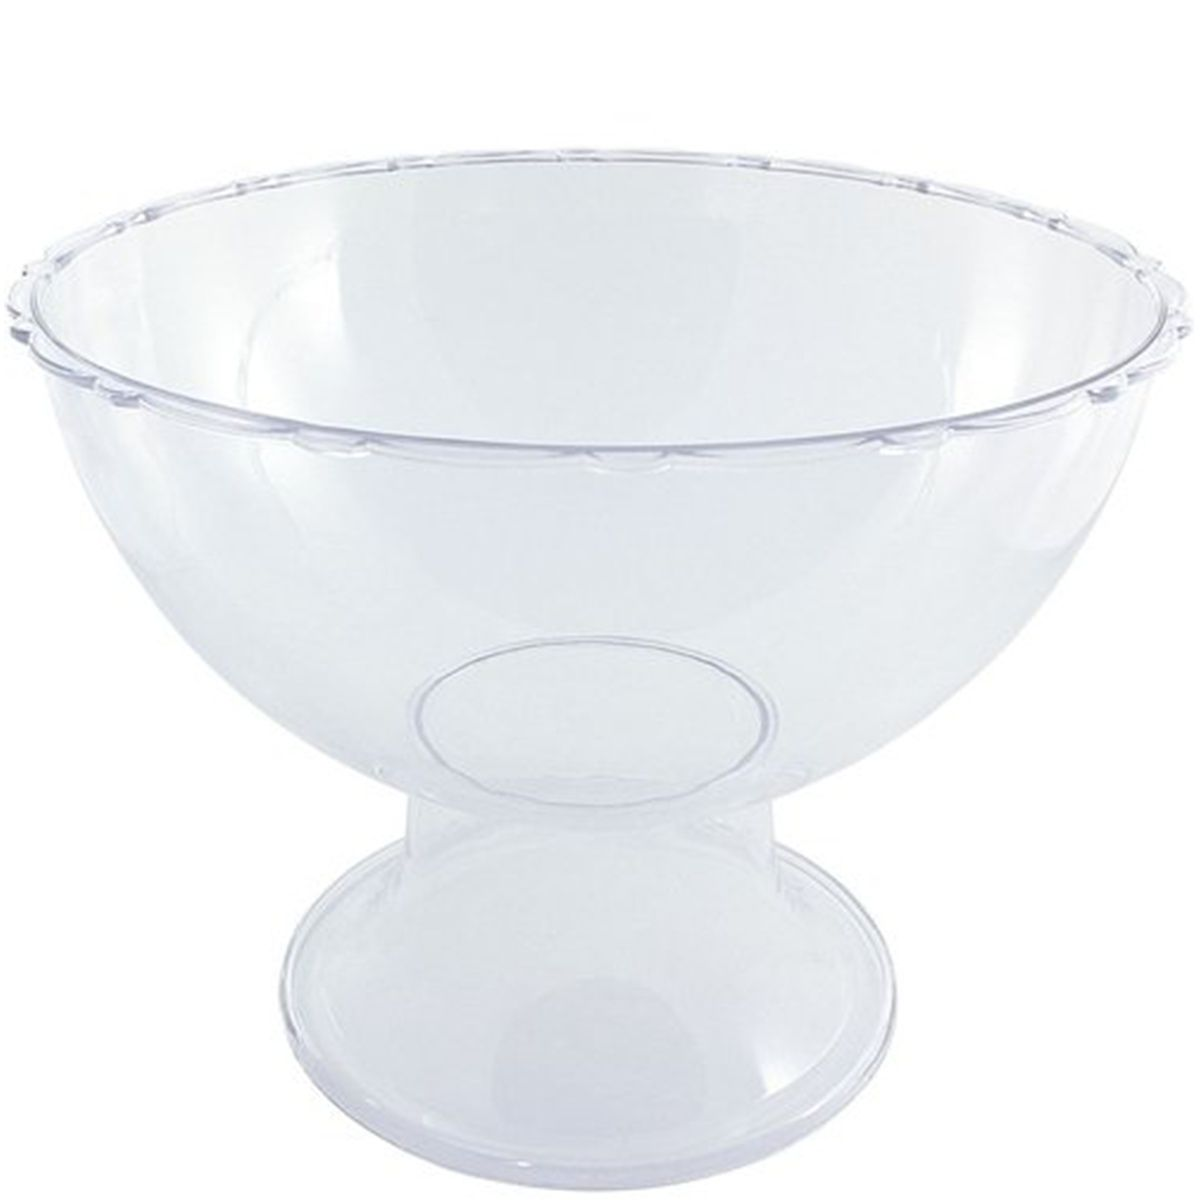 Taça Acrílica 2,8L LSCT